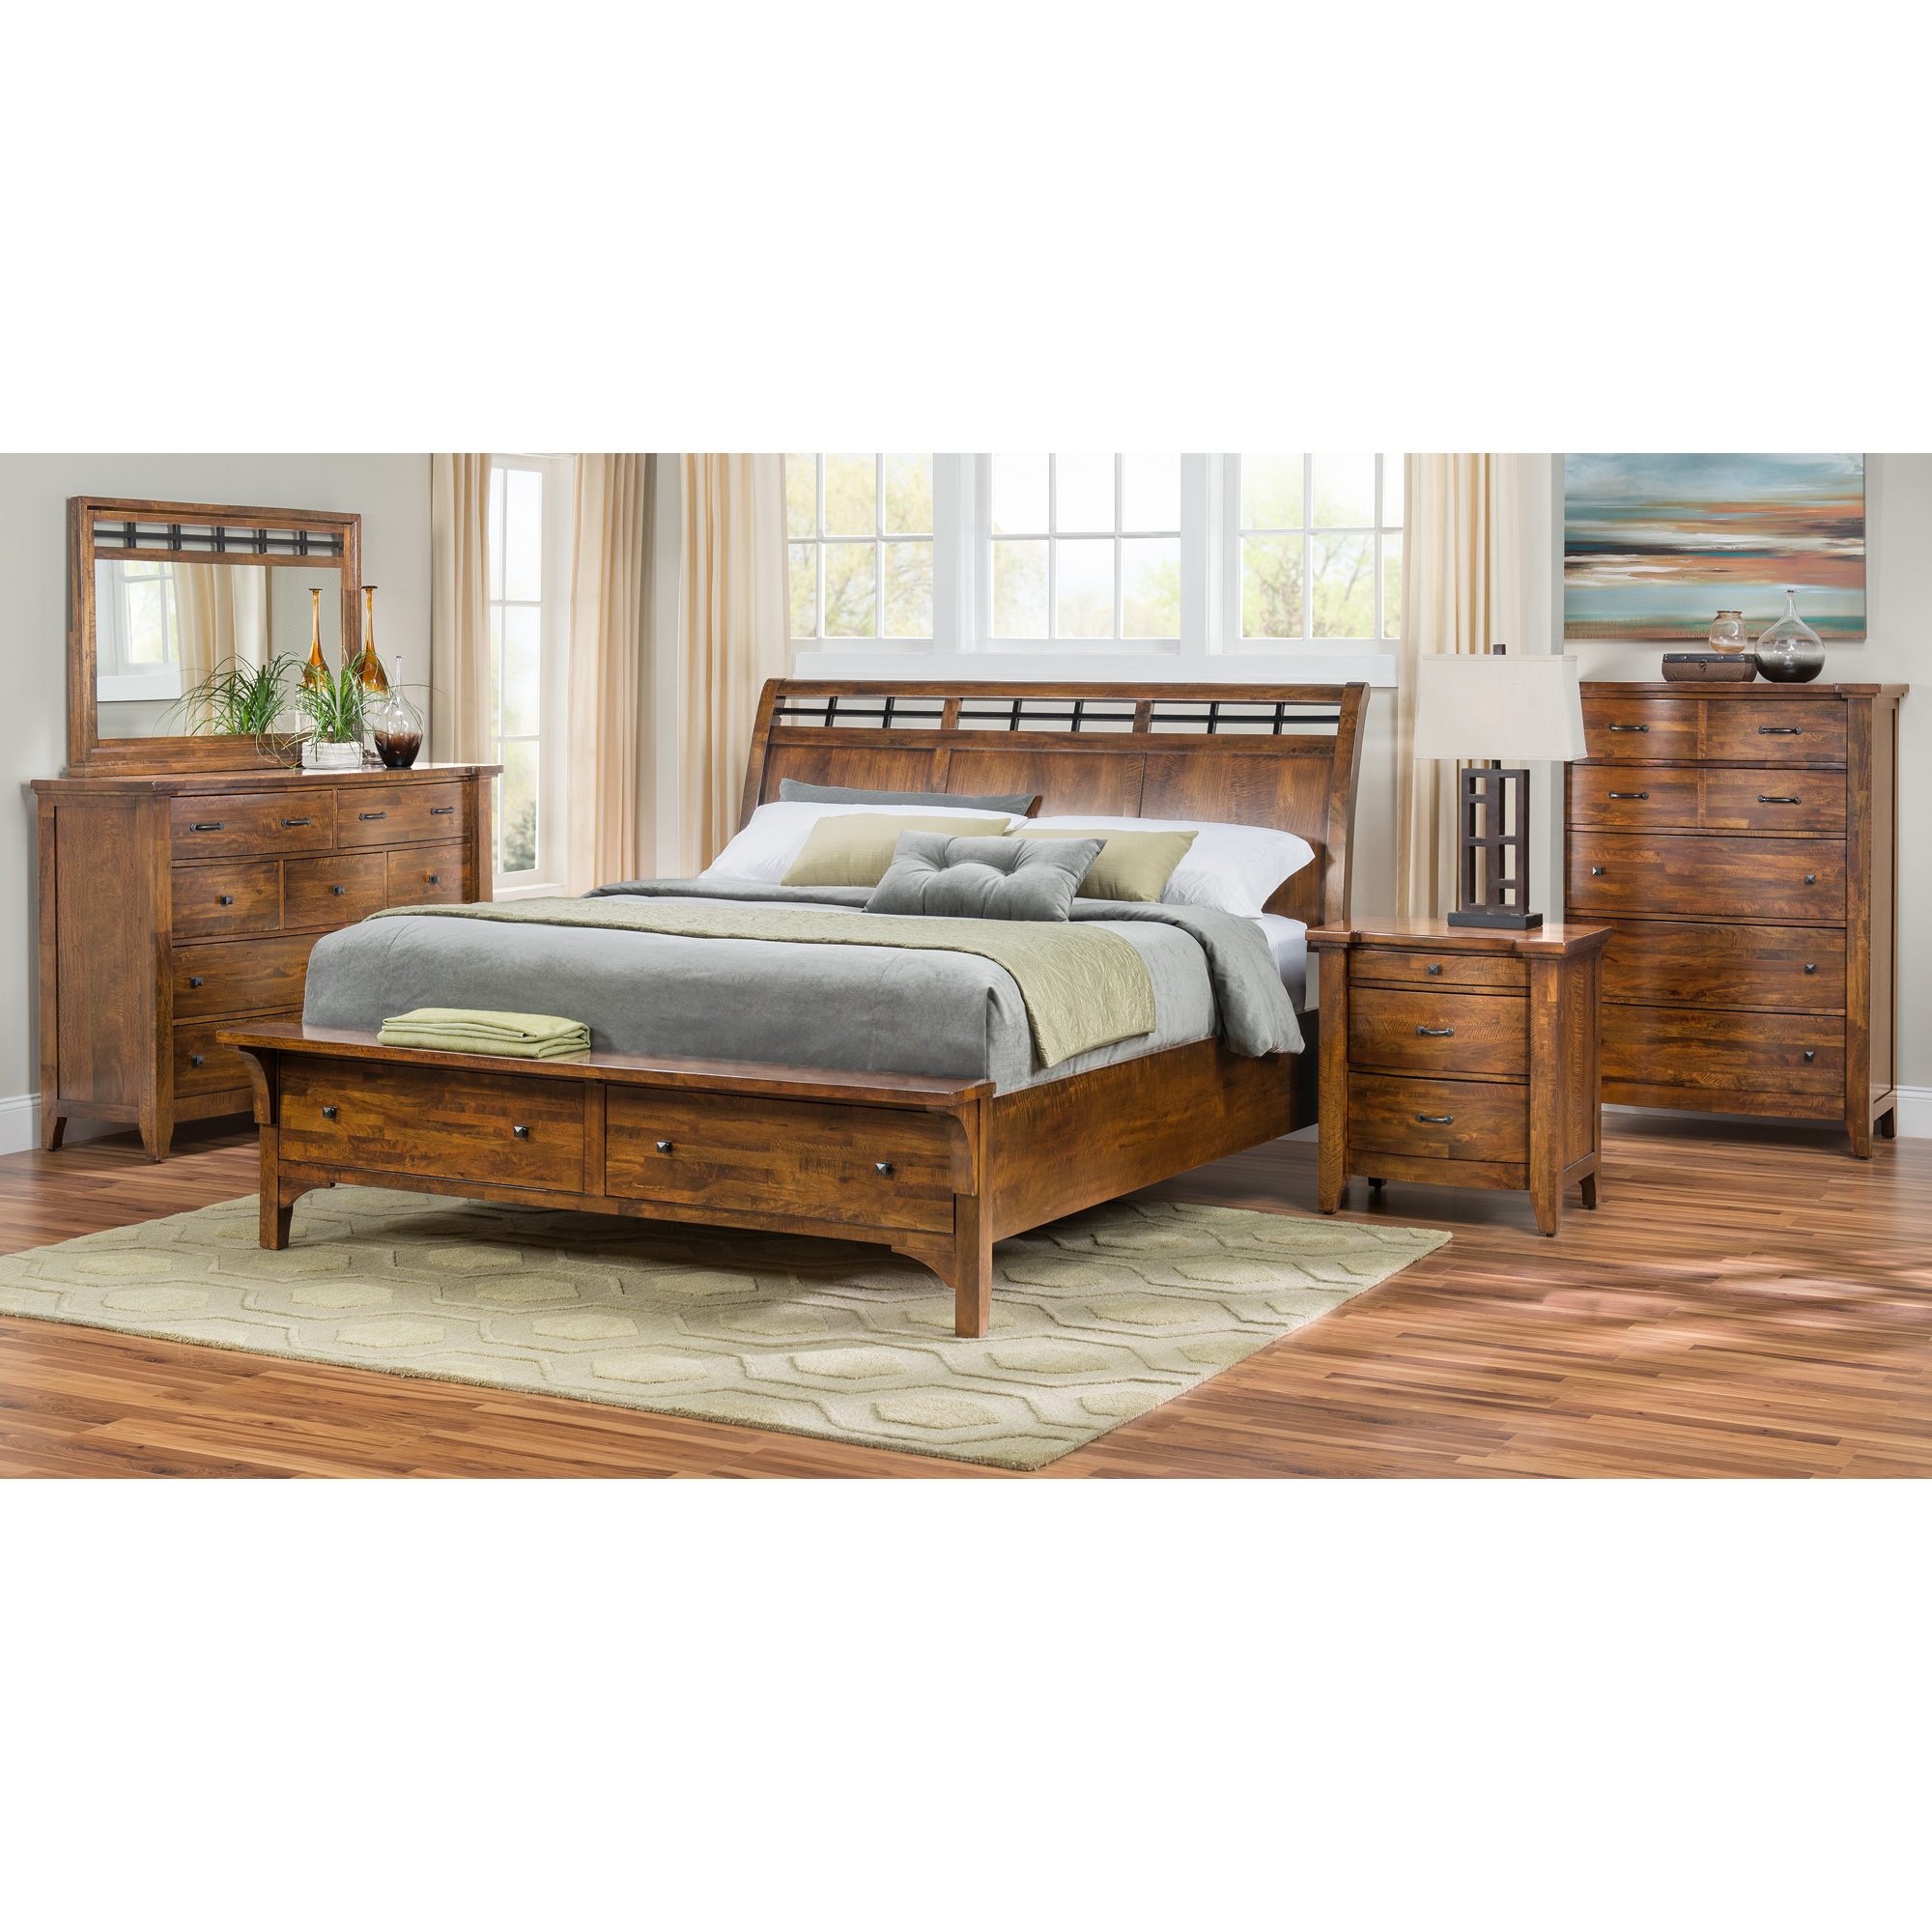 Napa Furniture   Whistler Retreat Dark Walnut King Storage 4 Piece Room Group Bedroom Set